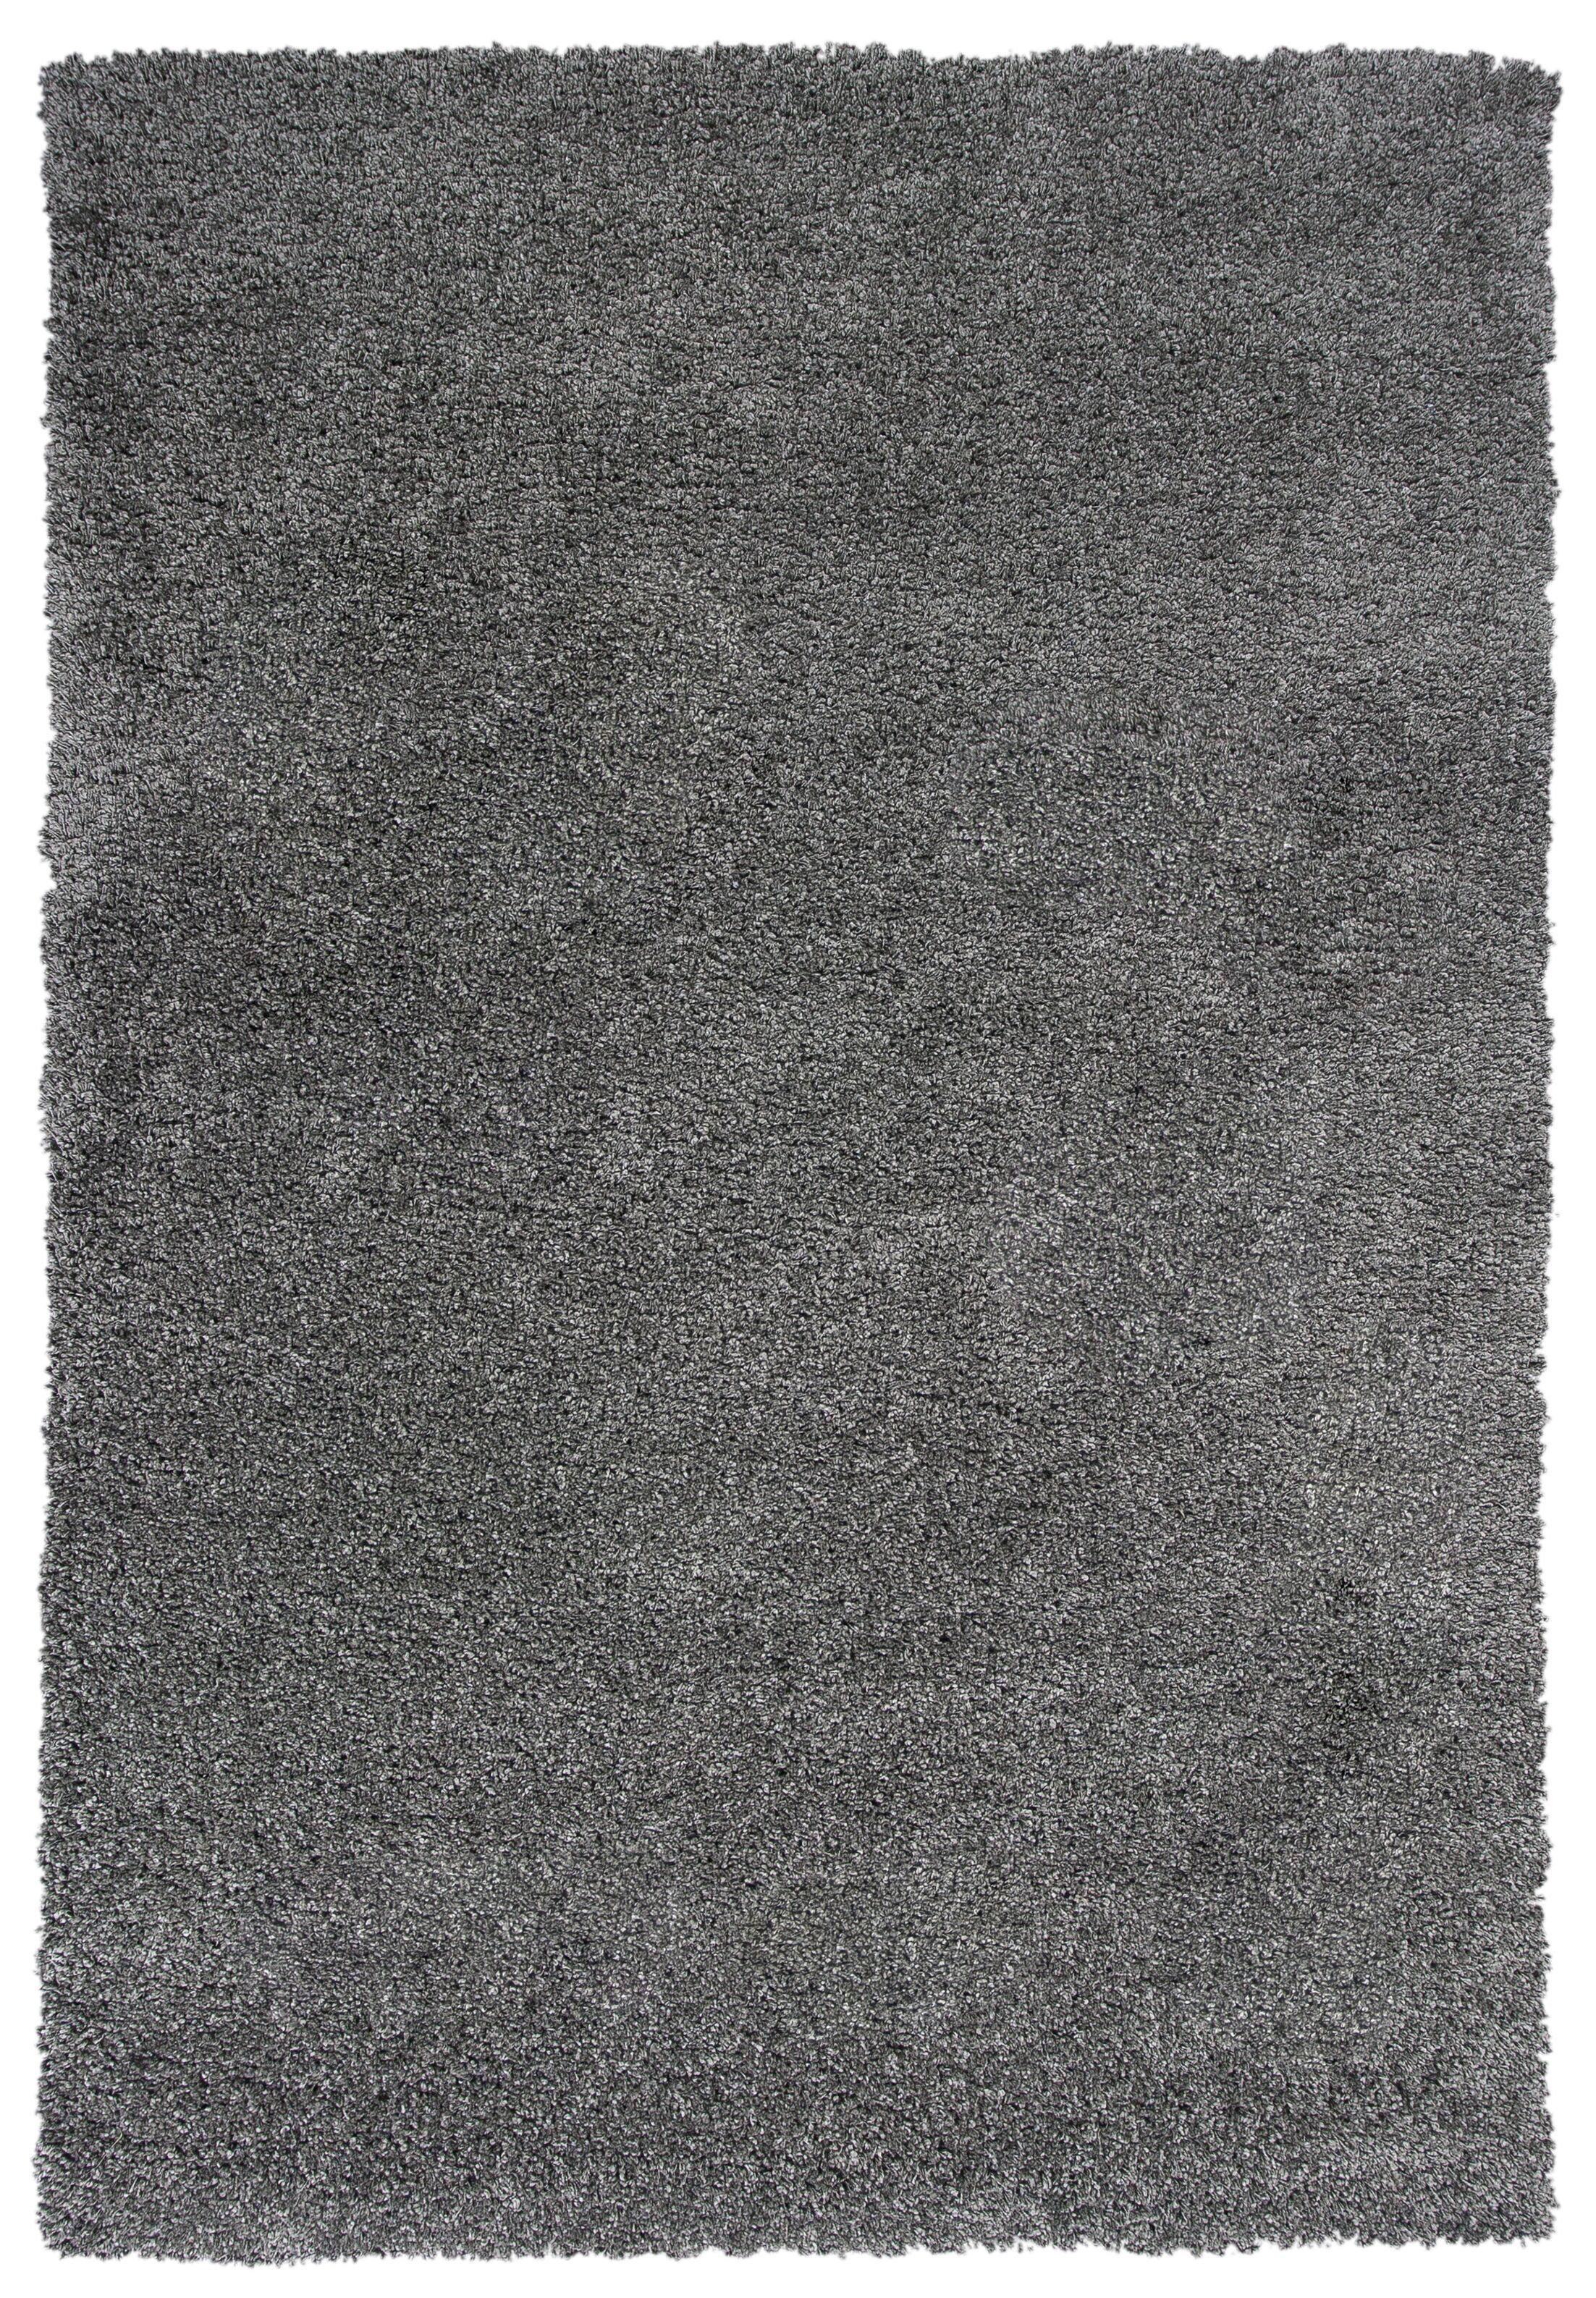 Electra Gray Area Rug Rug Size: 7'10